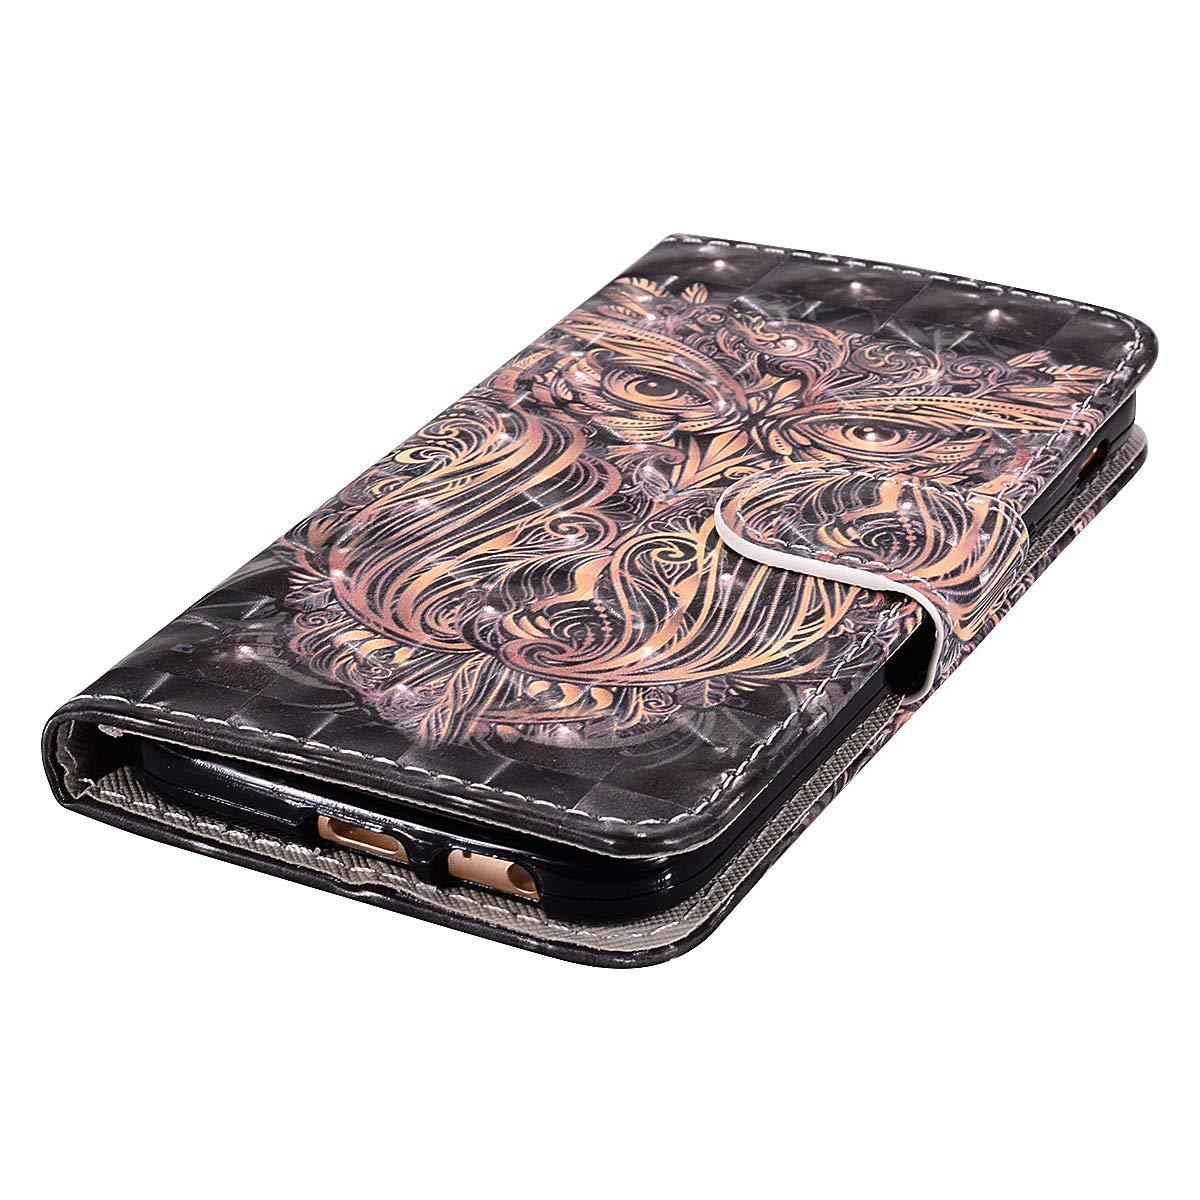 Felfy Kompatibel mit Galaxy A3 2017 H/ülle Tasche Leder PU Handyh/ülle 3D Creative Bunt Muster Leder Wallet Case Flip Cover Klapph/ülle Brieftasche Lederh/ülle mit Kartenf/ächer Sch/ädel